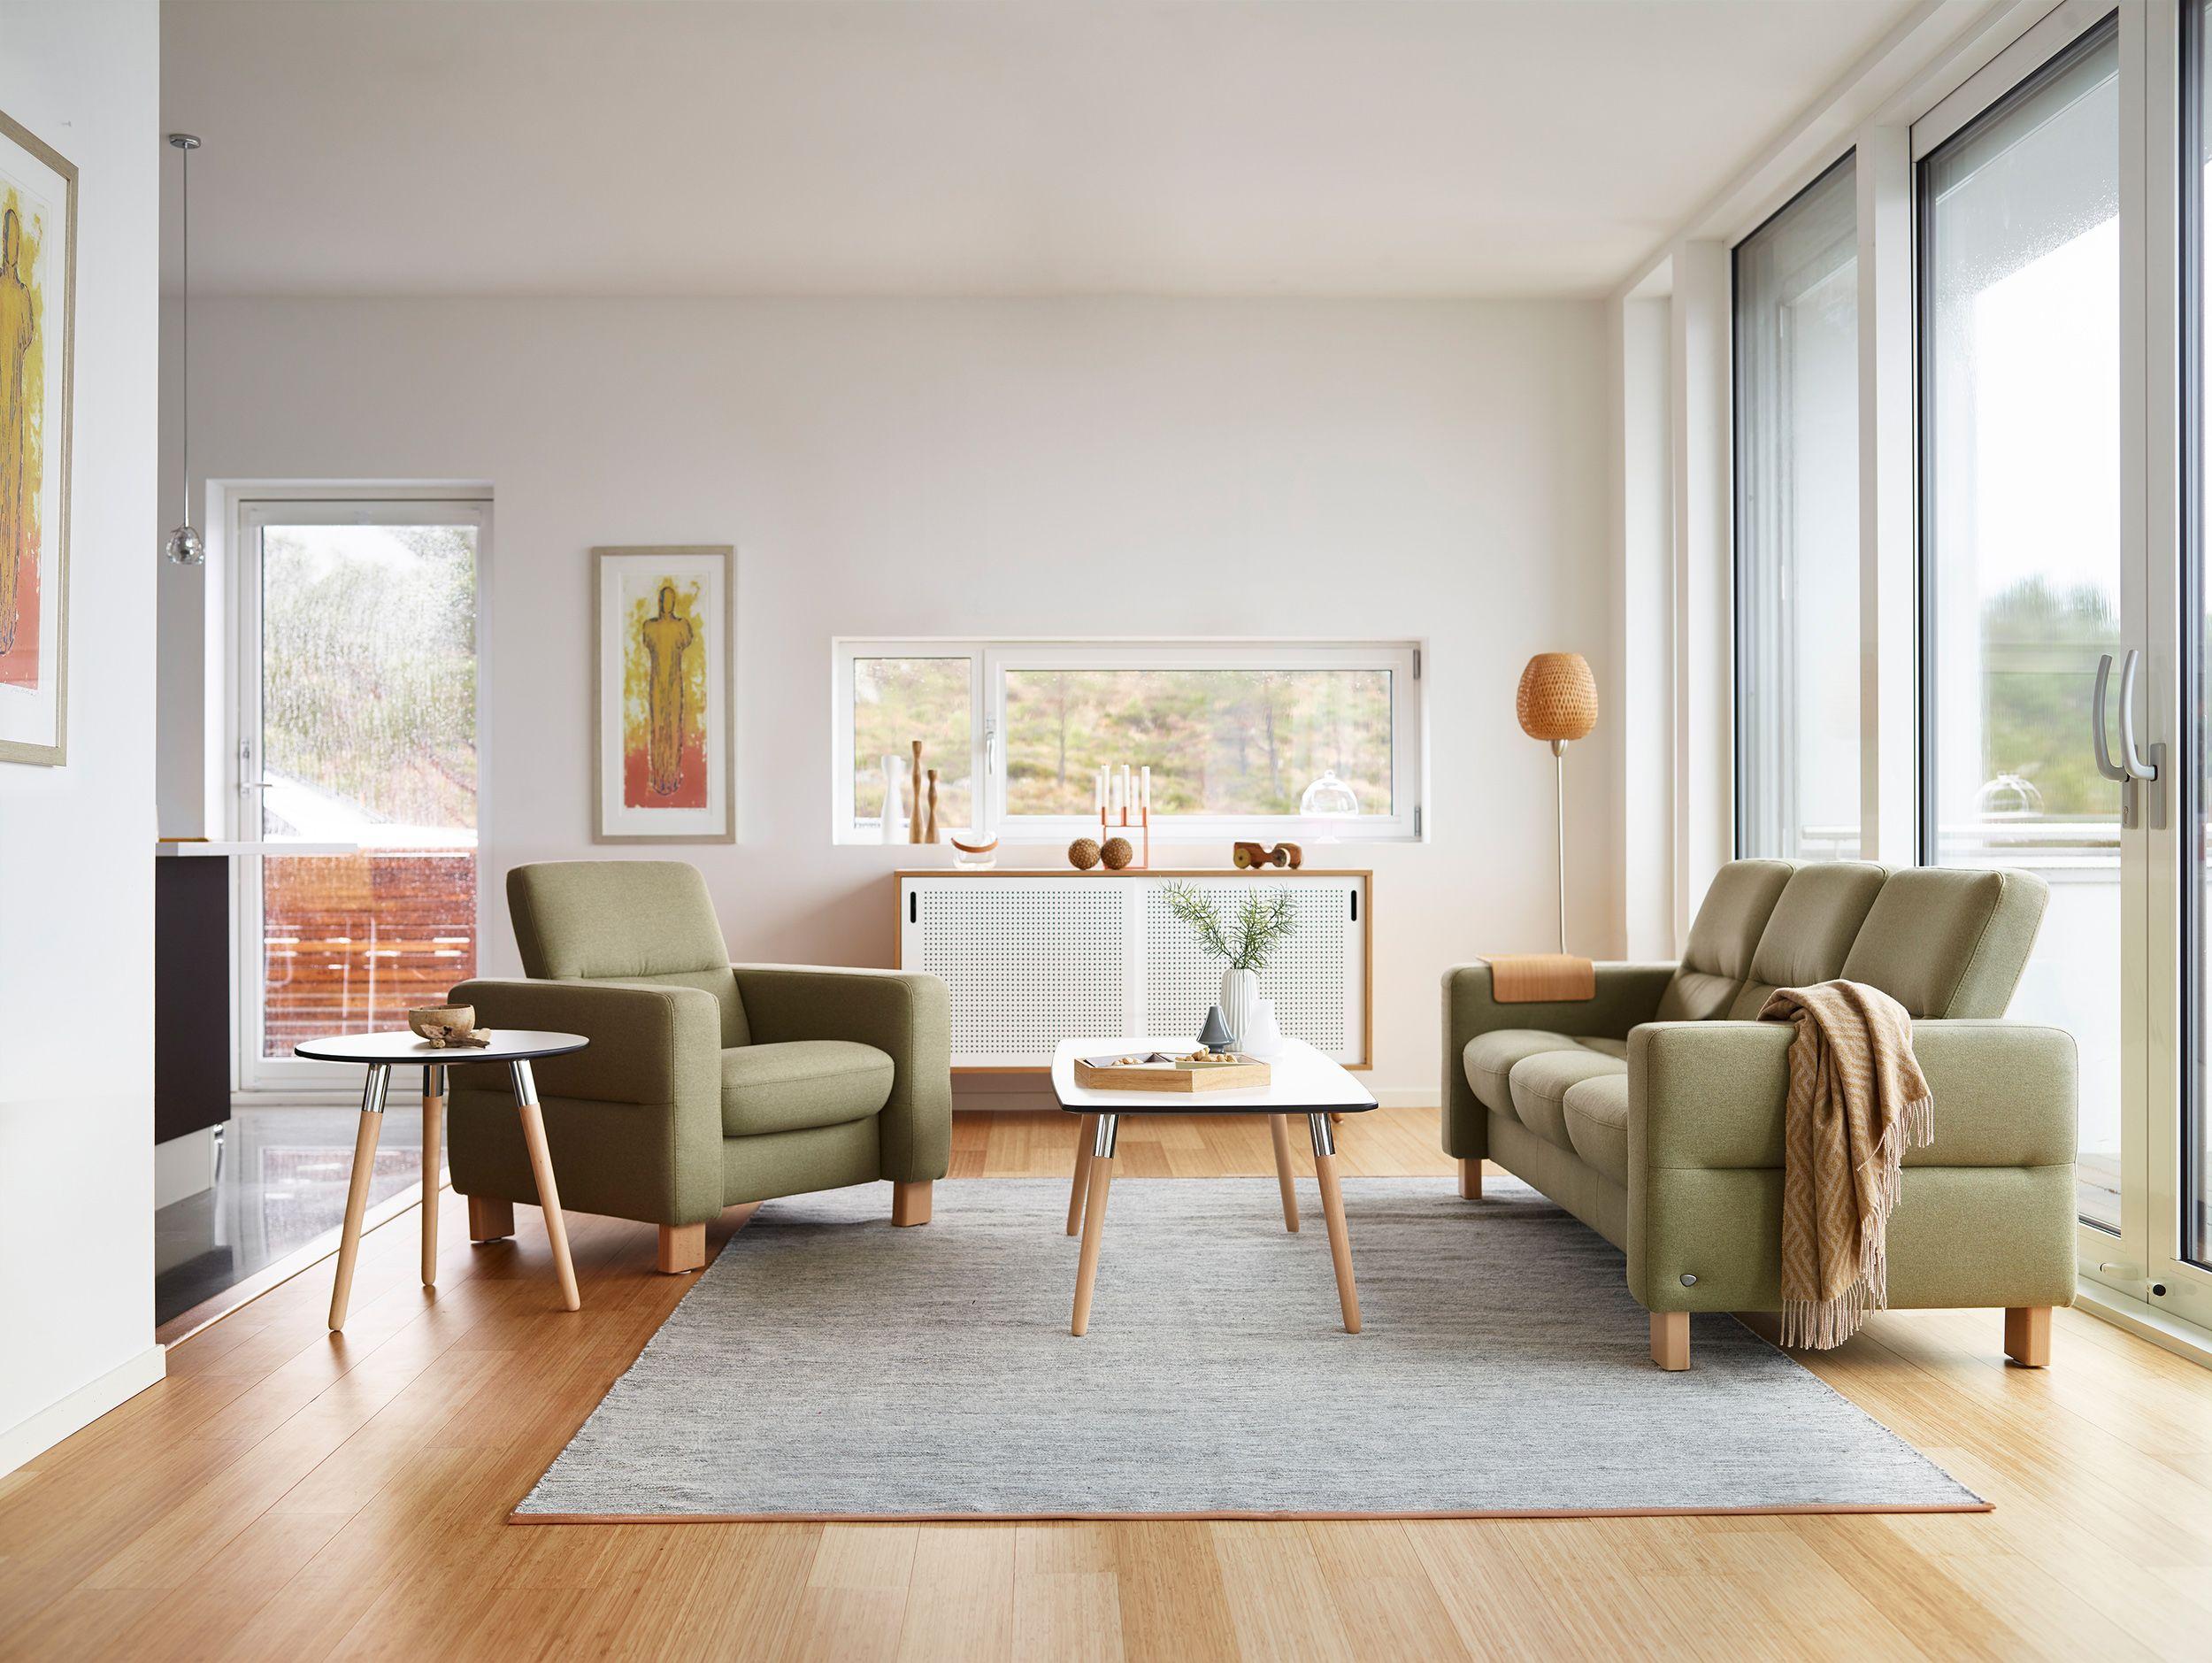 stressless sessel wave williamflooring. Black Bedroom Furniture Sets. Home Design Ideas